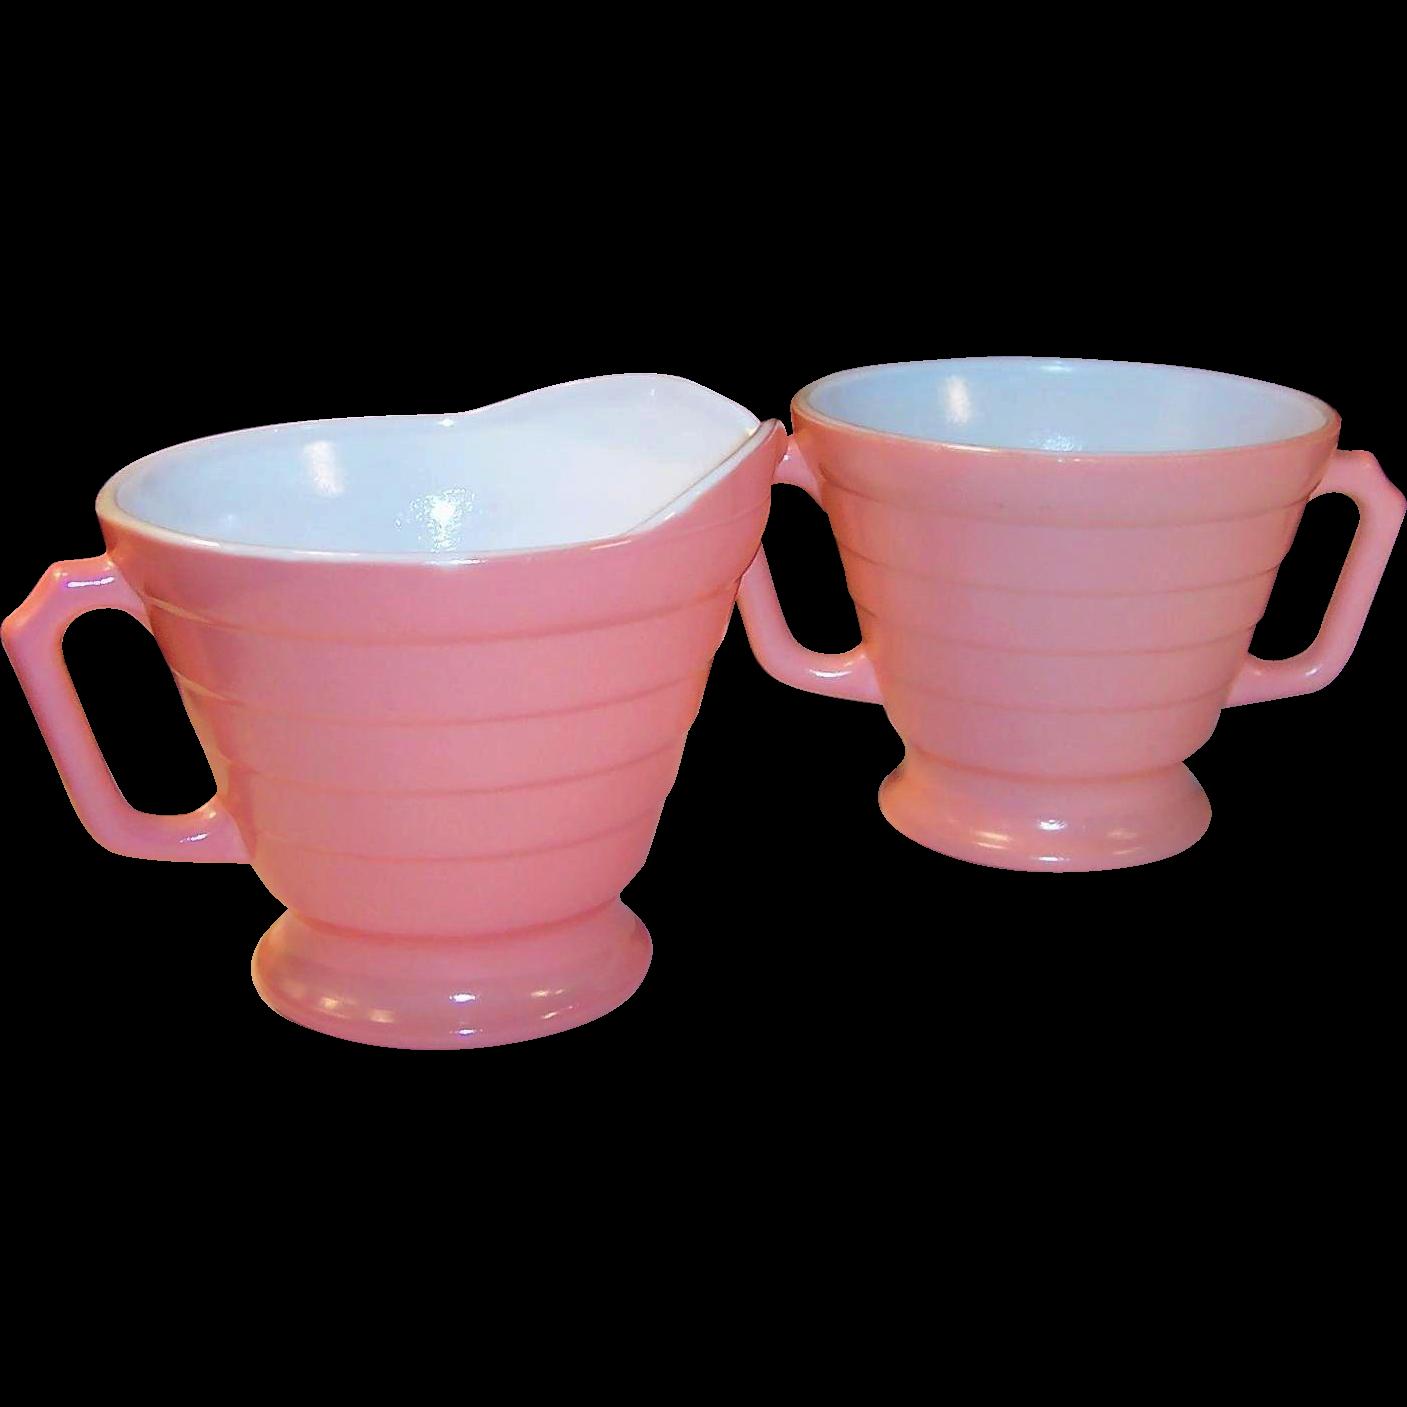 Hazel Atlas Moderntone Fired On Pink Creamer Sugar Set